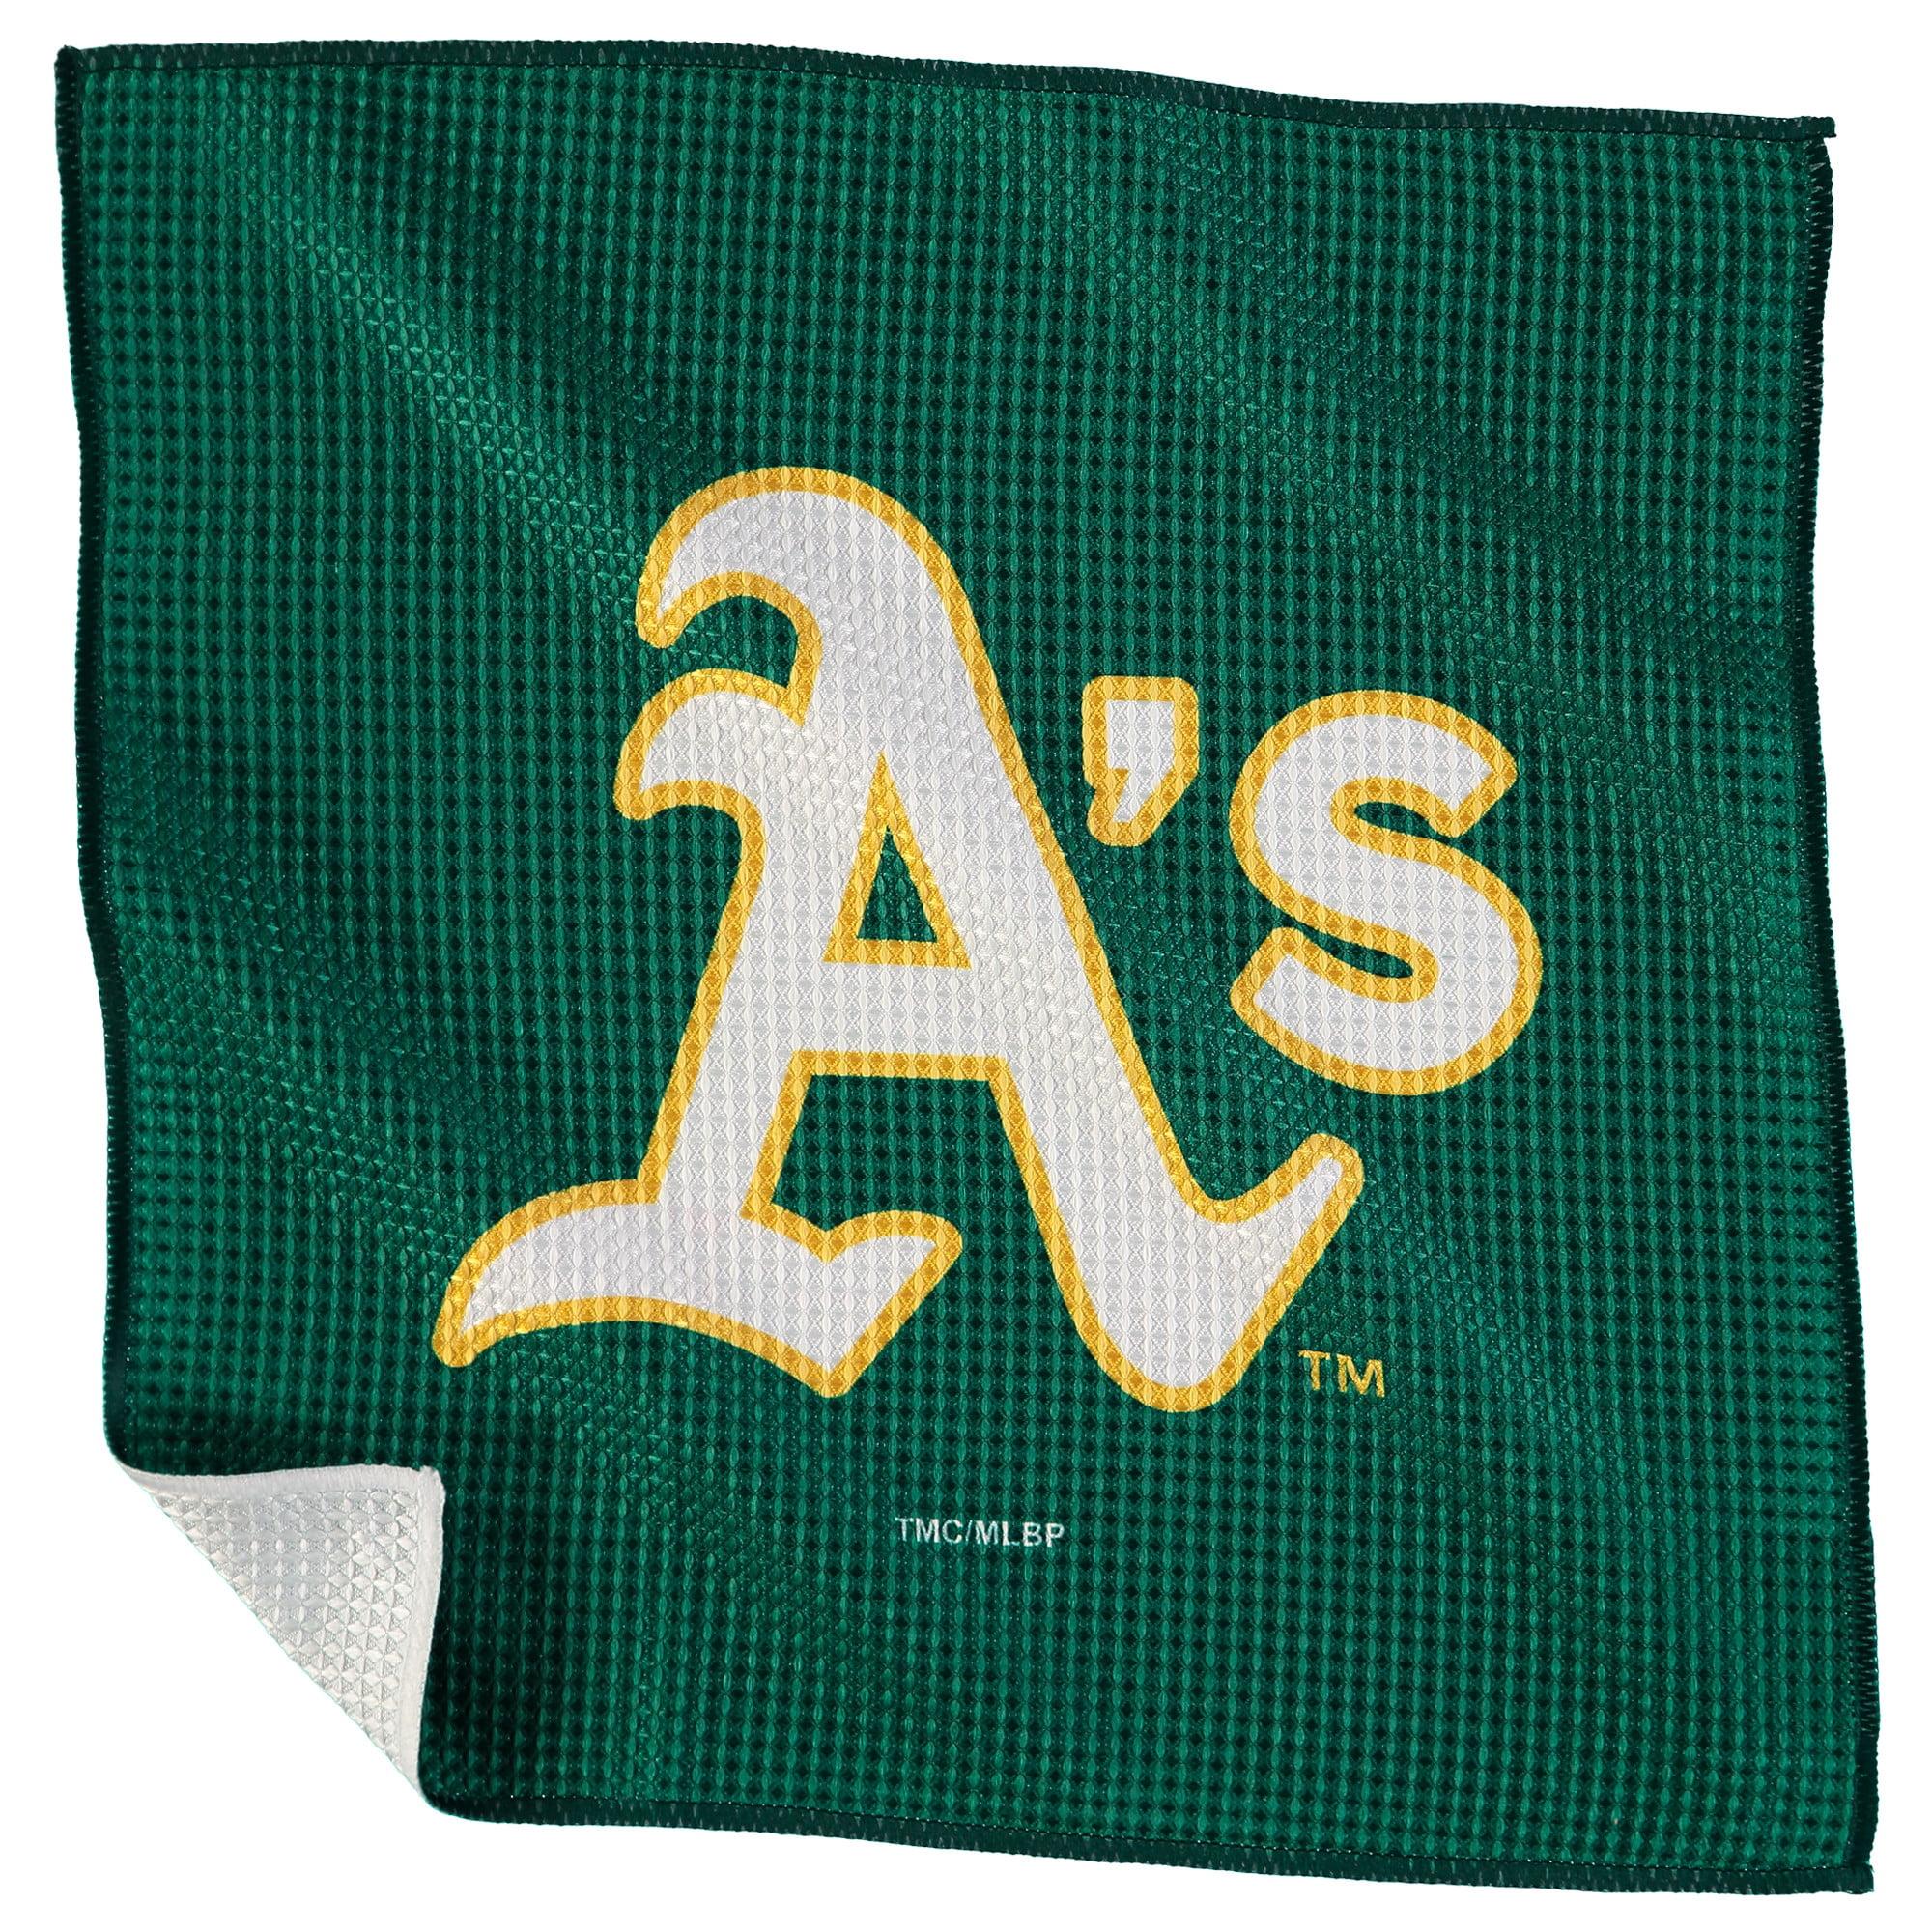 "Oakland Athletics 16"" x 16"" Microfiber Towel - No Size"